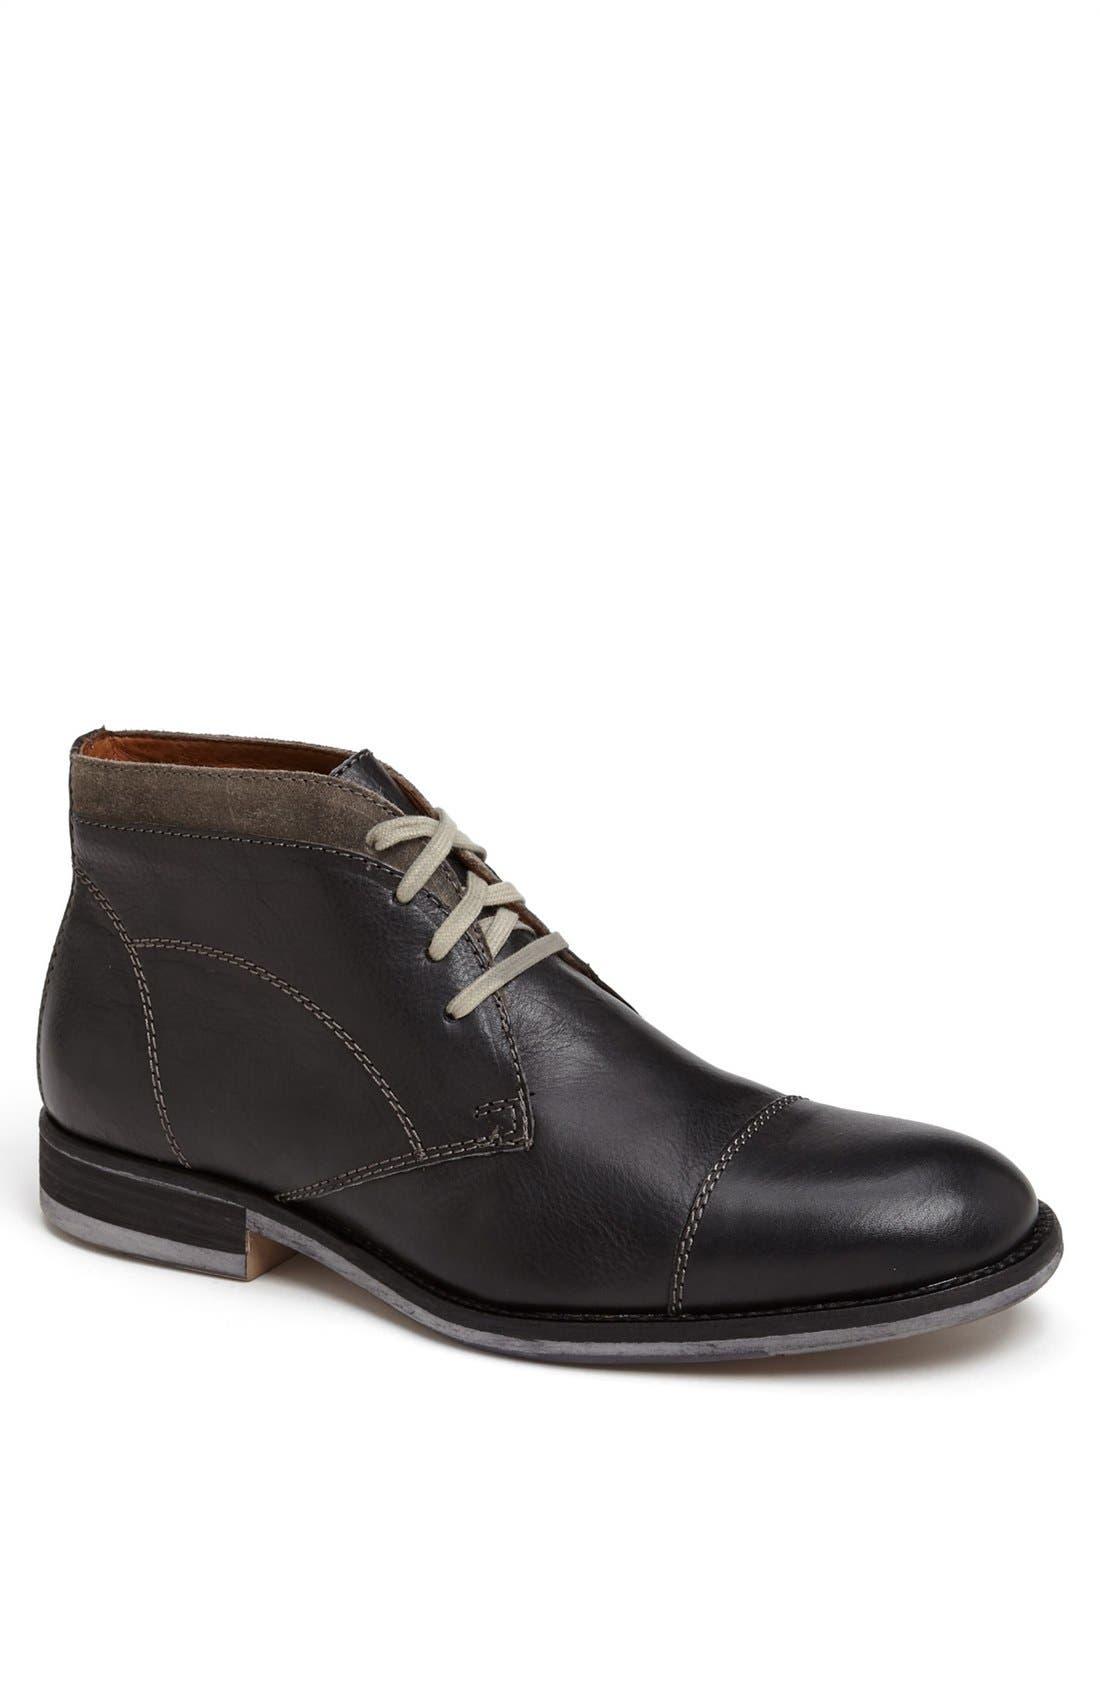 Alternate Image 1 Selected - J&M 1850 'Decatur' Chukka Boot (Men)